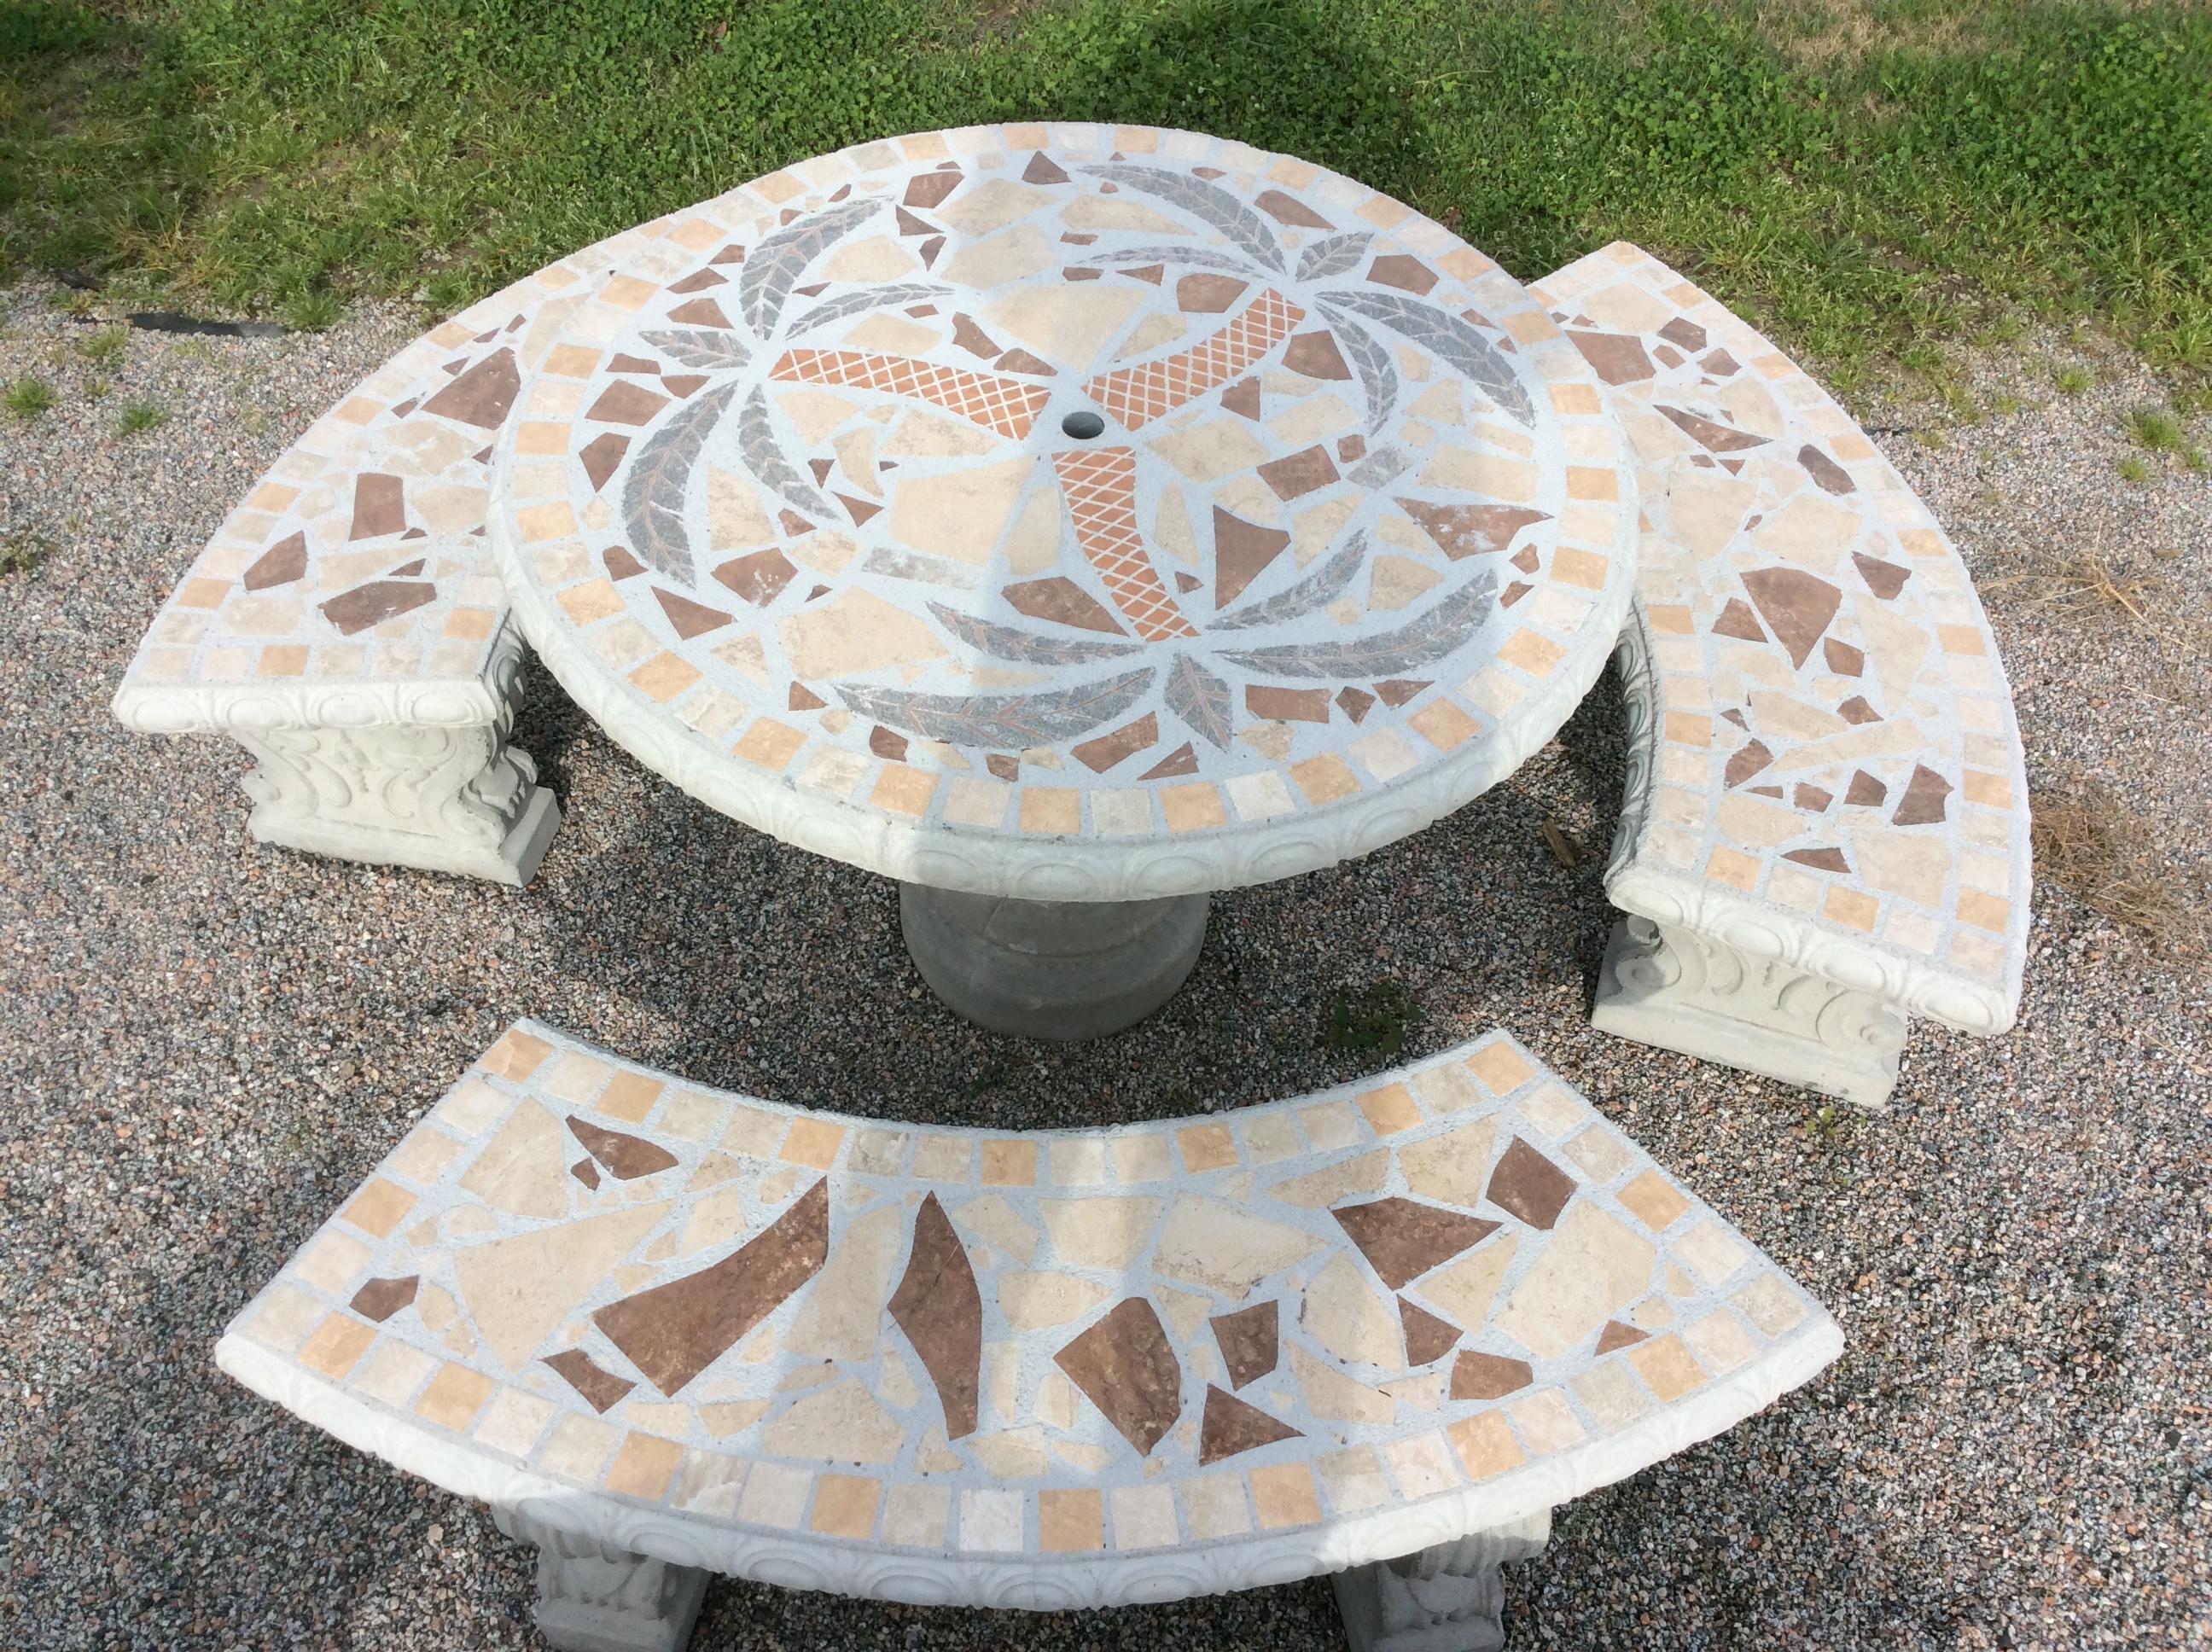 Tbs112 Palm Tree Mosaic Table Set The Cement Barn